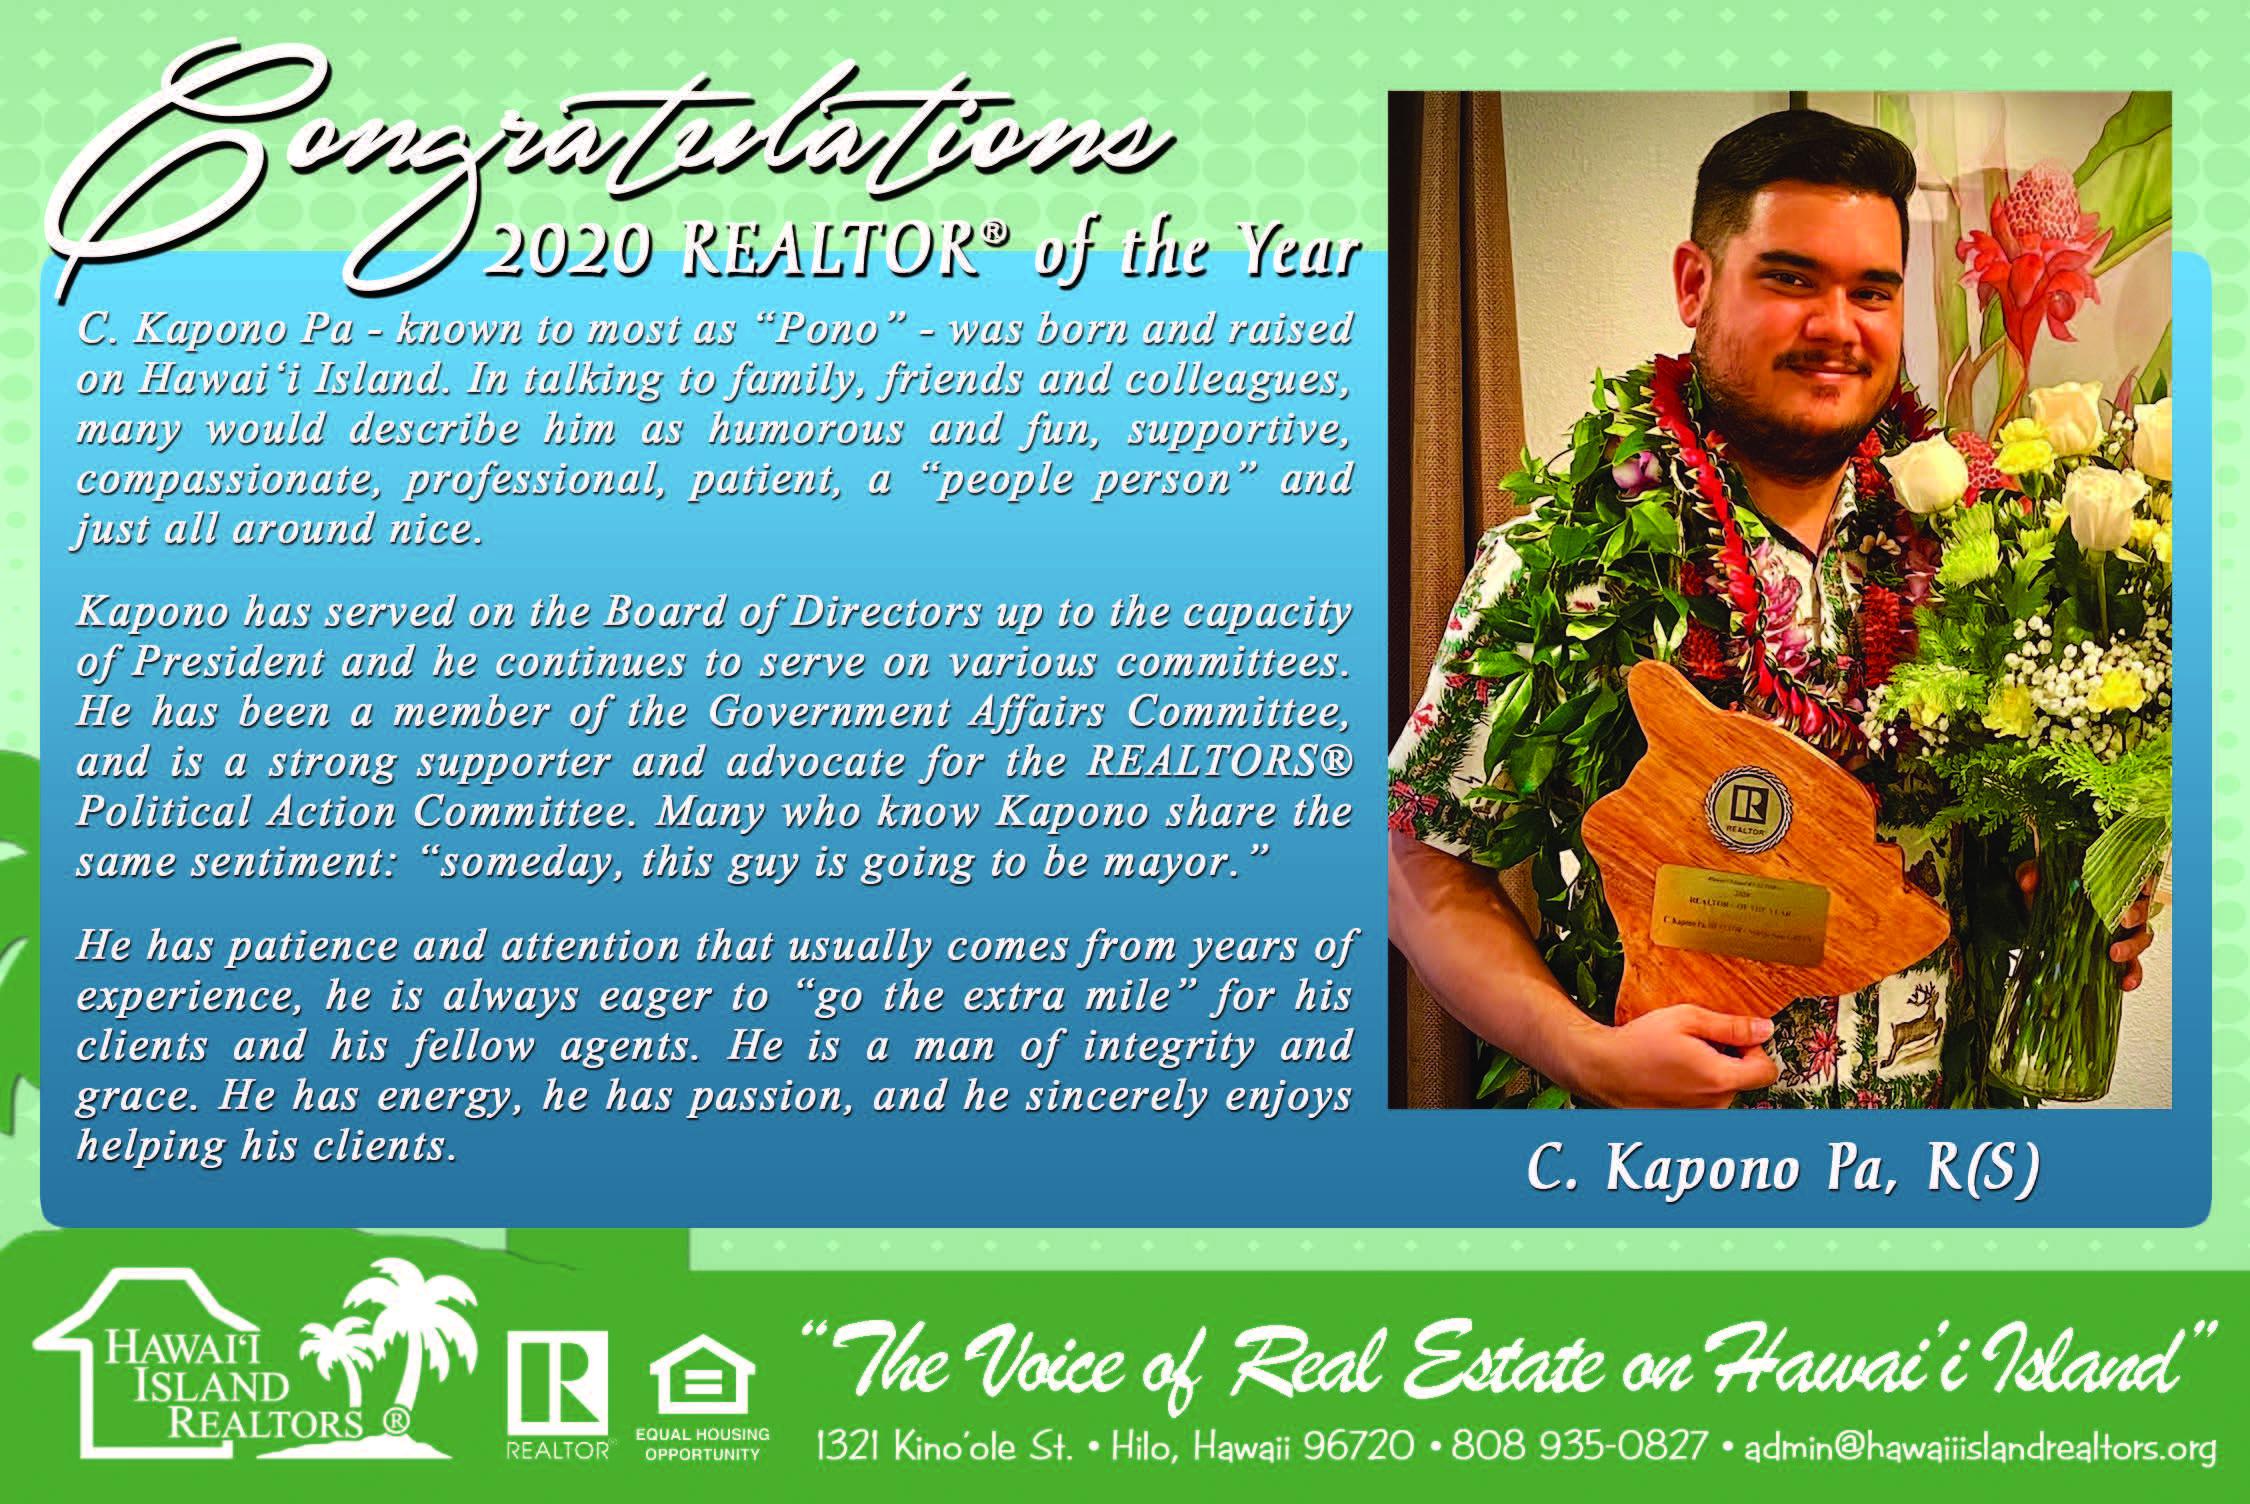 Congratulations 2020 HIR REALTOR® of the Year, C. Kapono Pa!